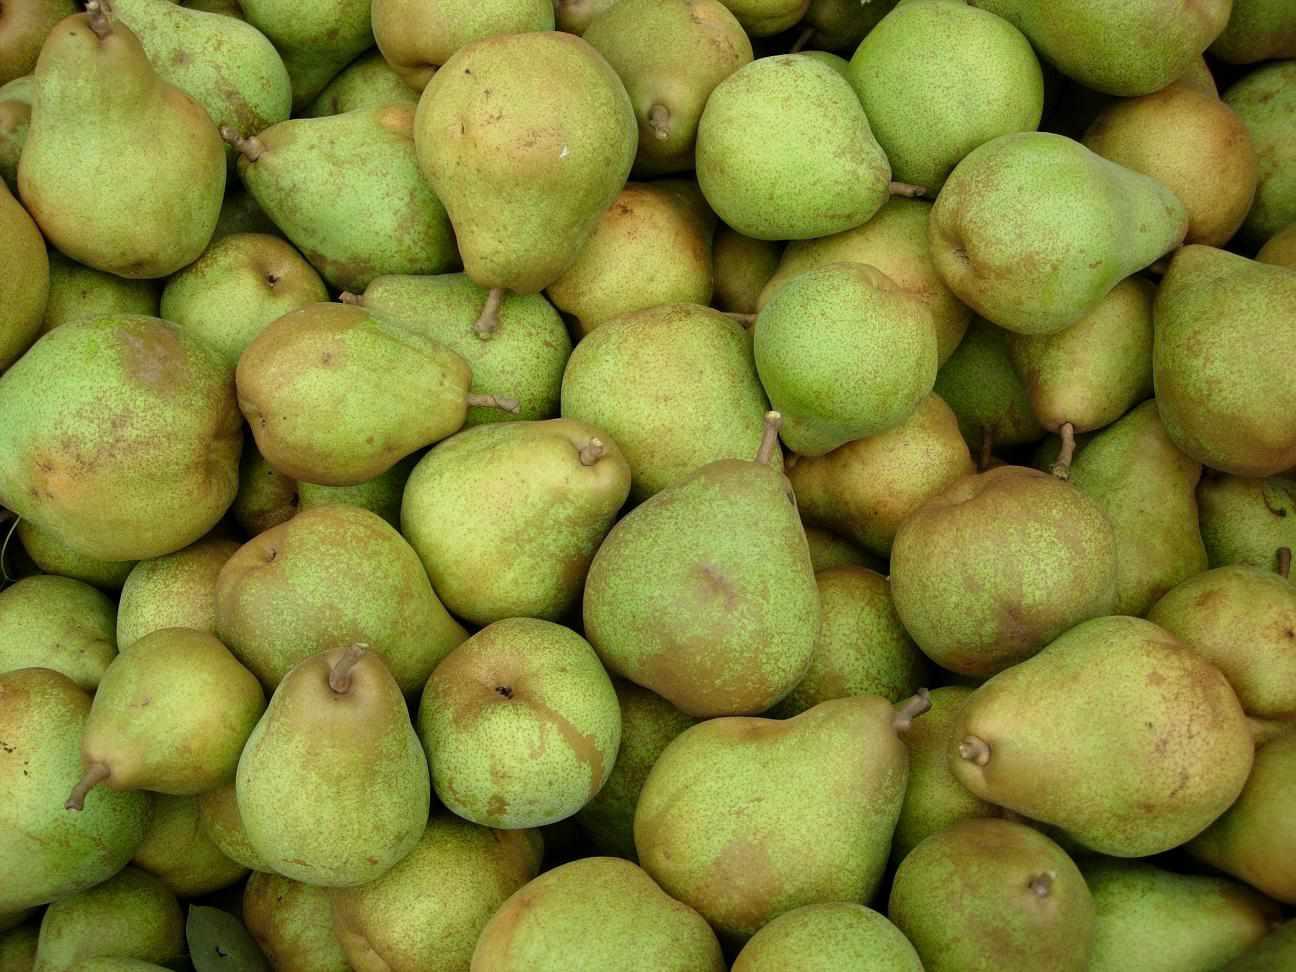 pile of green Comice pears